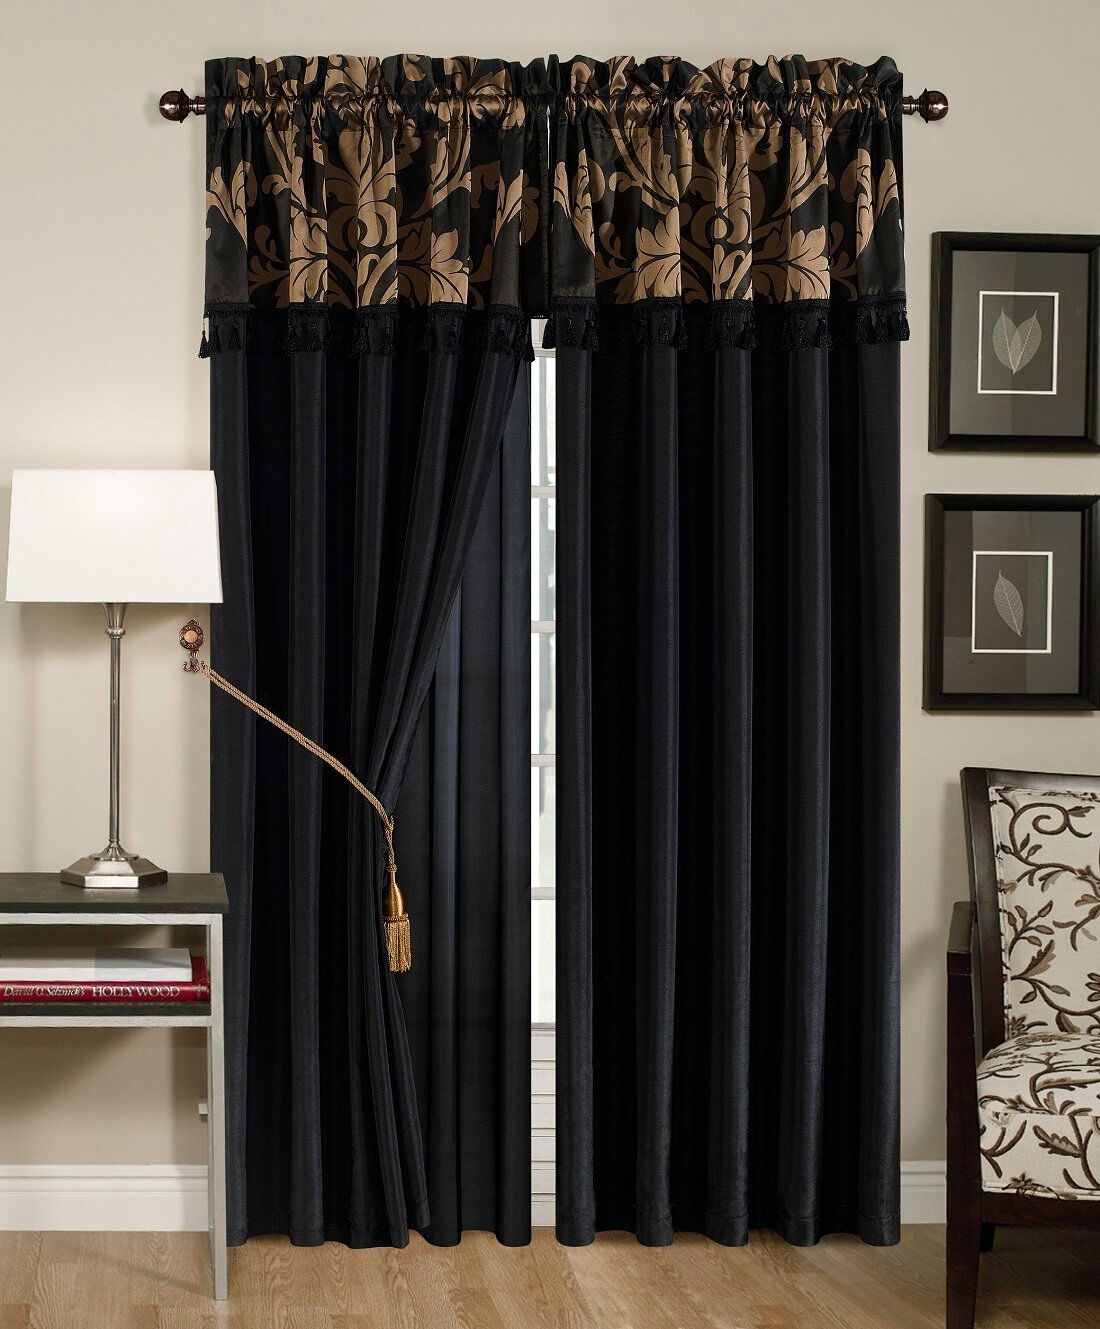 4 pc floral window curtain set bedroom drape valance panel